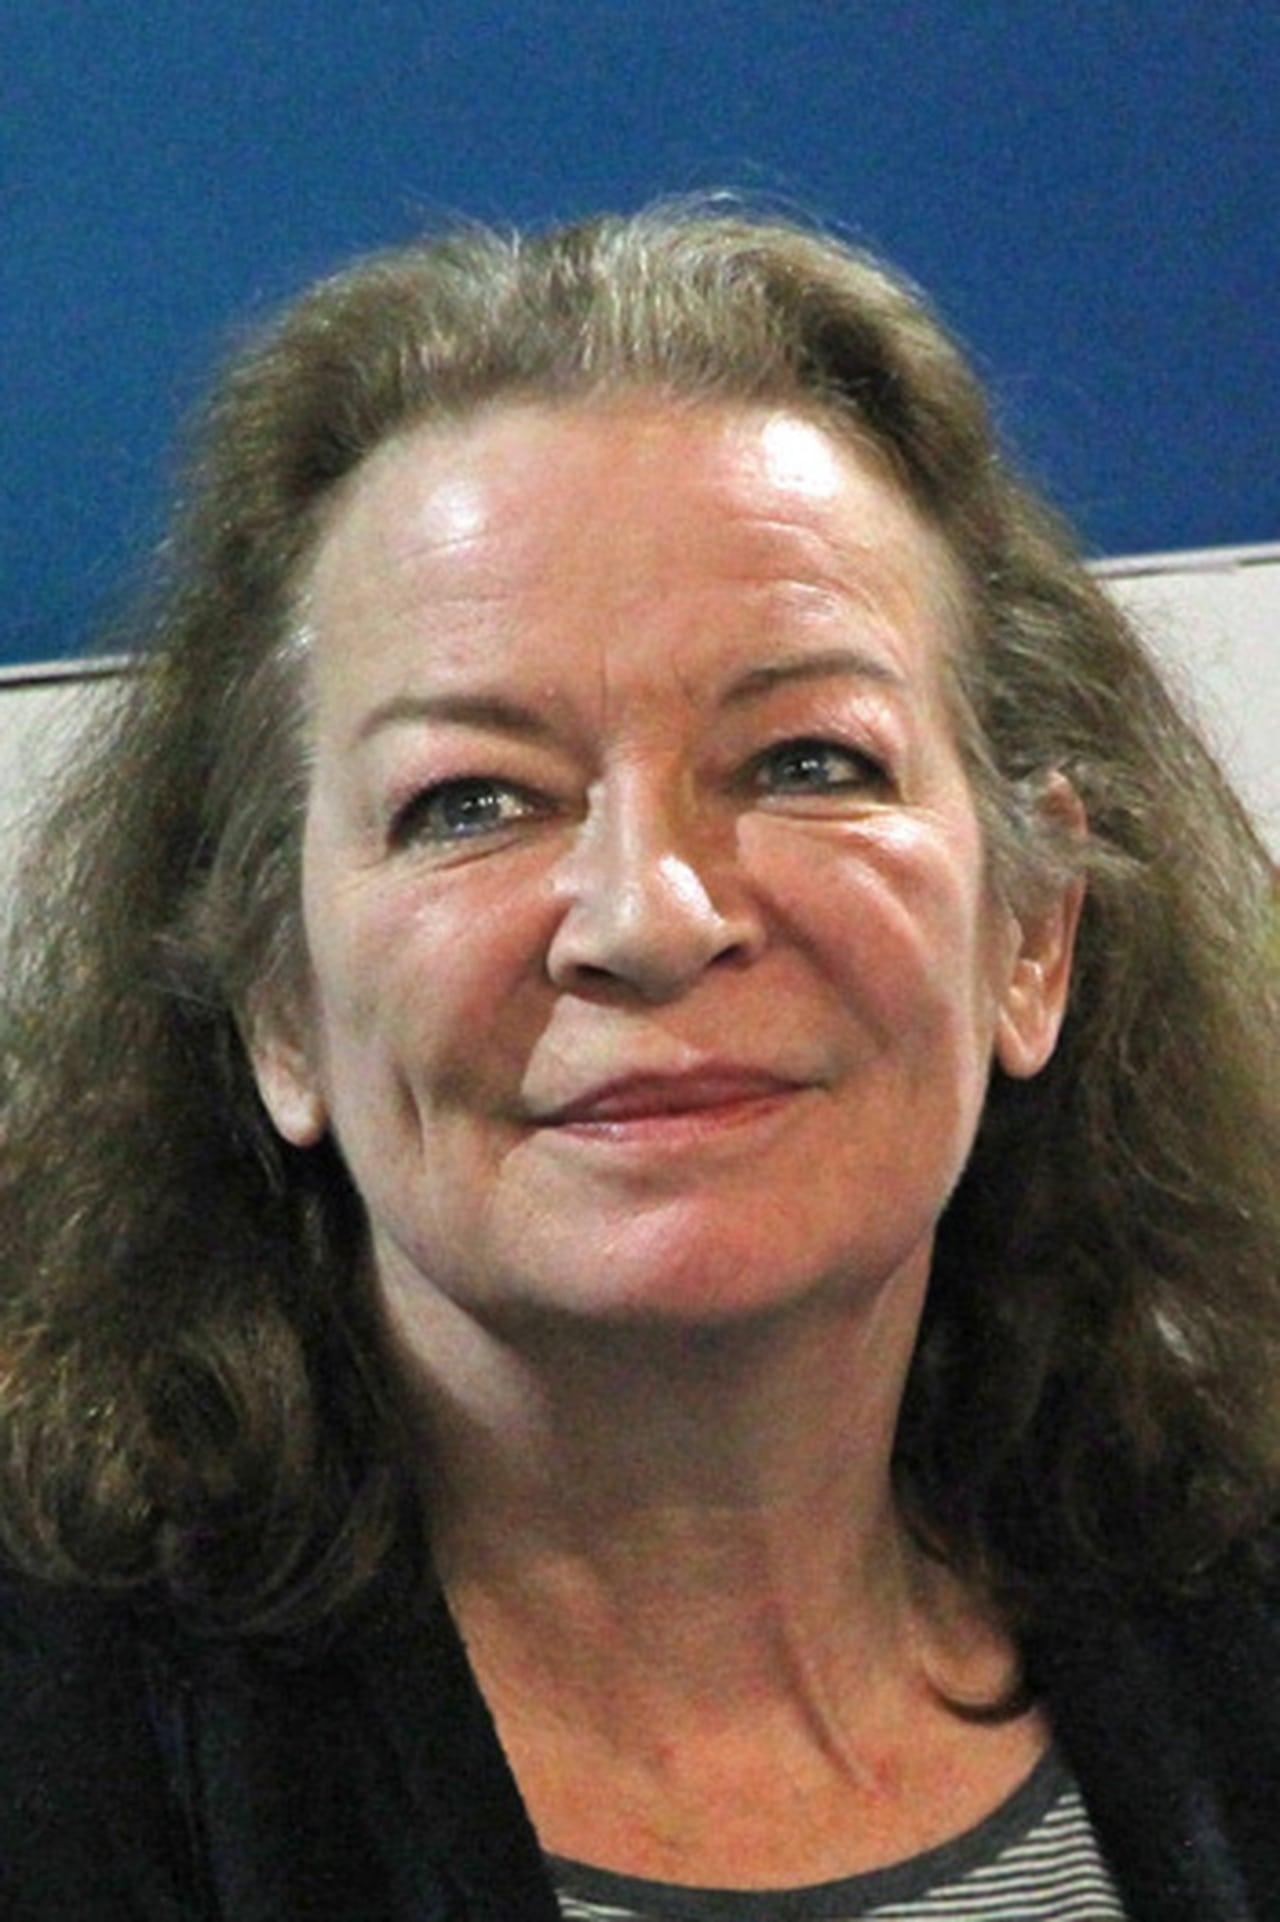 Clare Higgins isMistress Revels